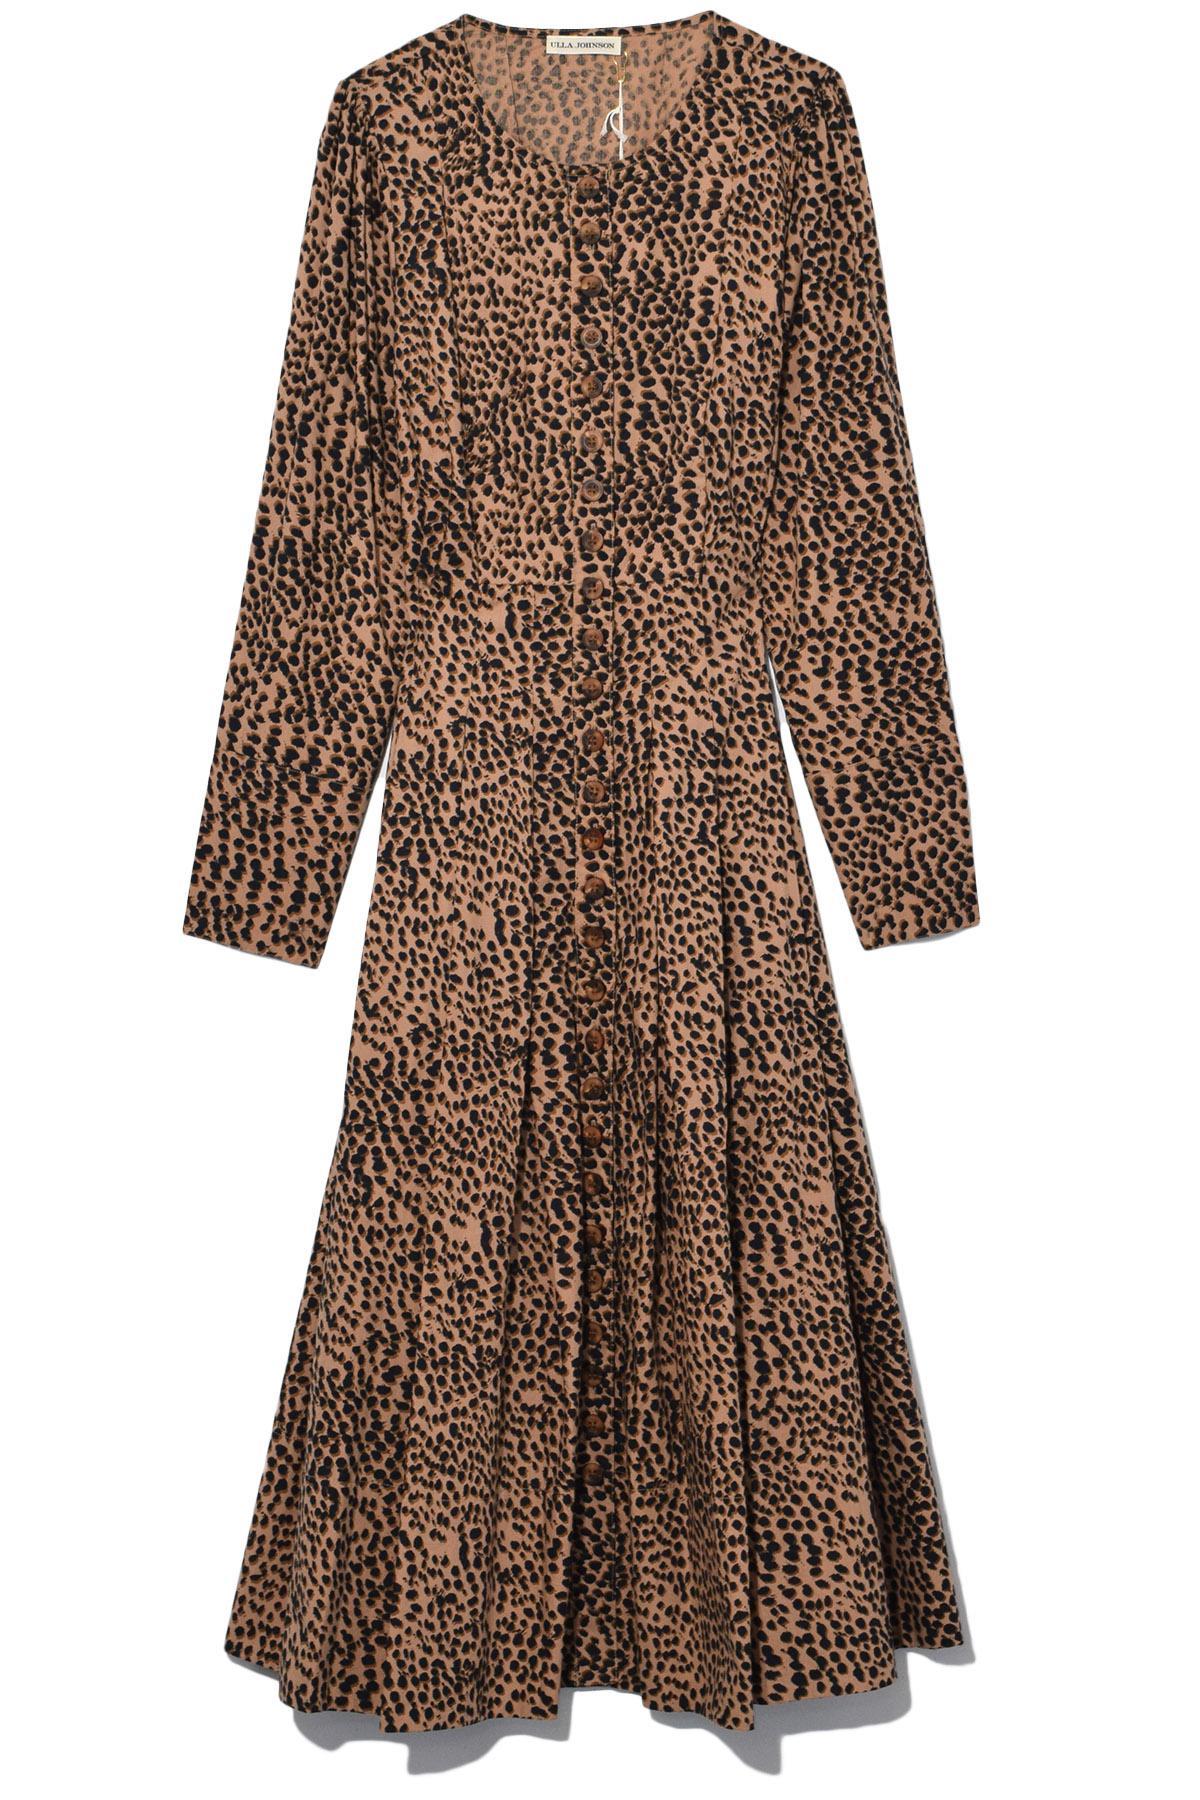 0f17416b75b9 Lyst - Ulla Johnson Bernadette Dress In Cheetah in Brown